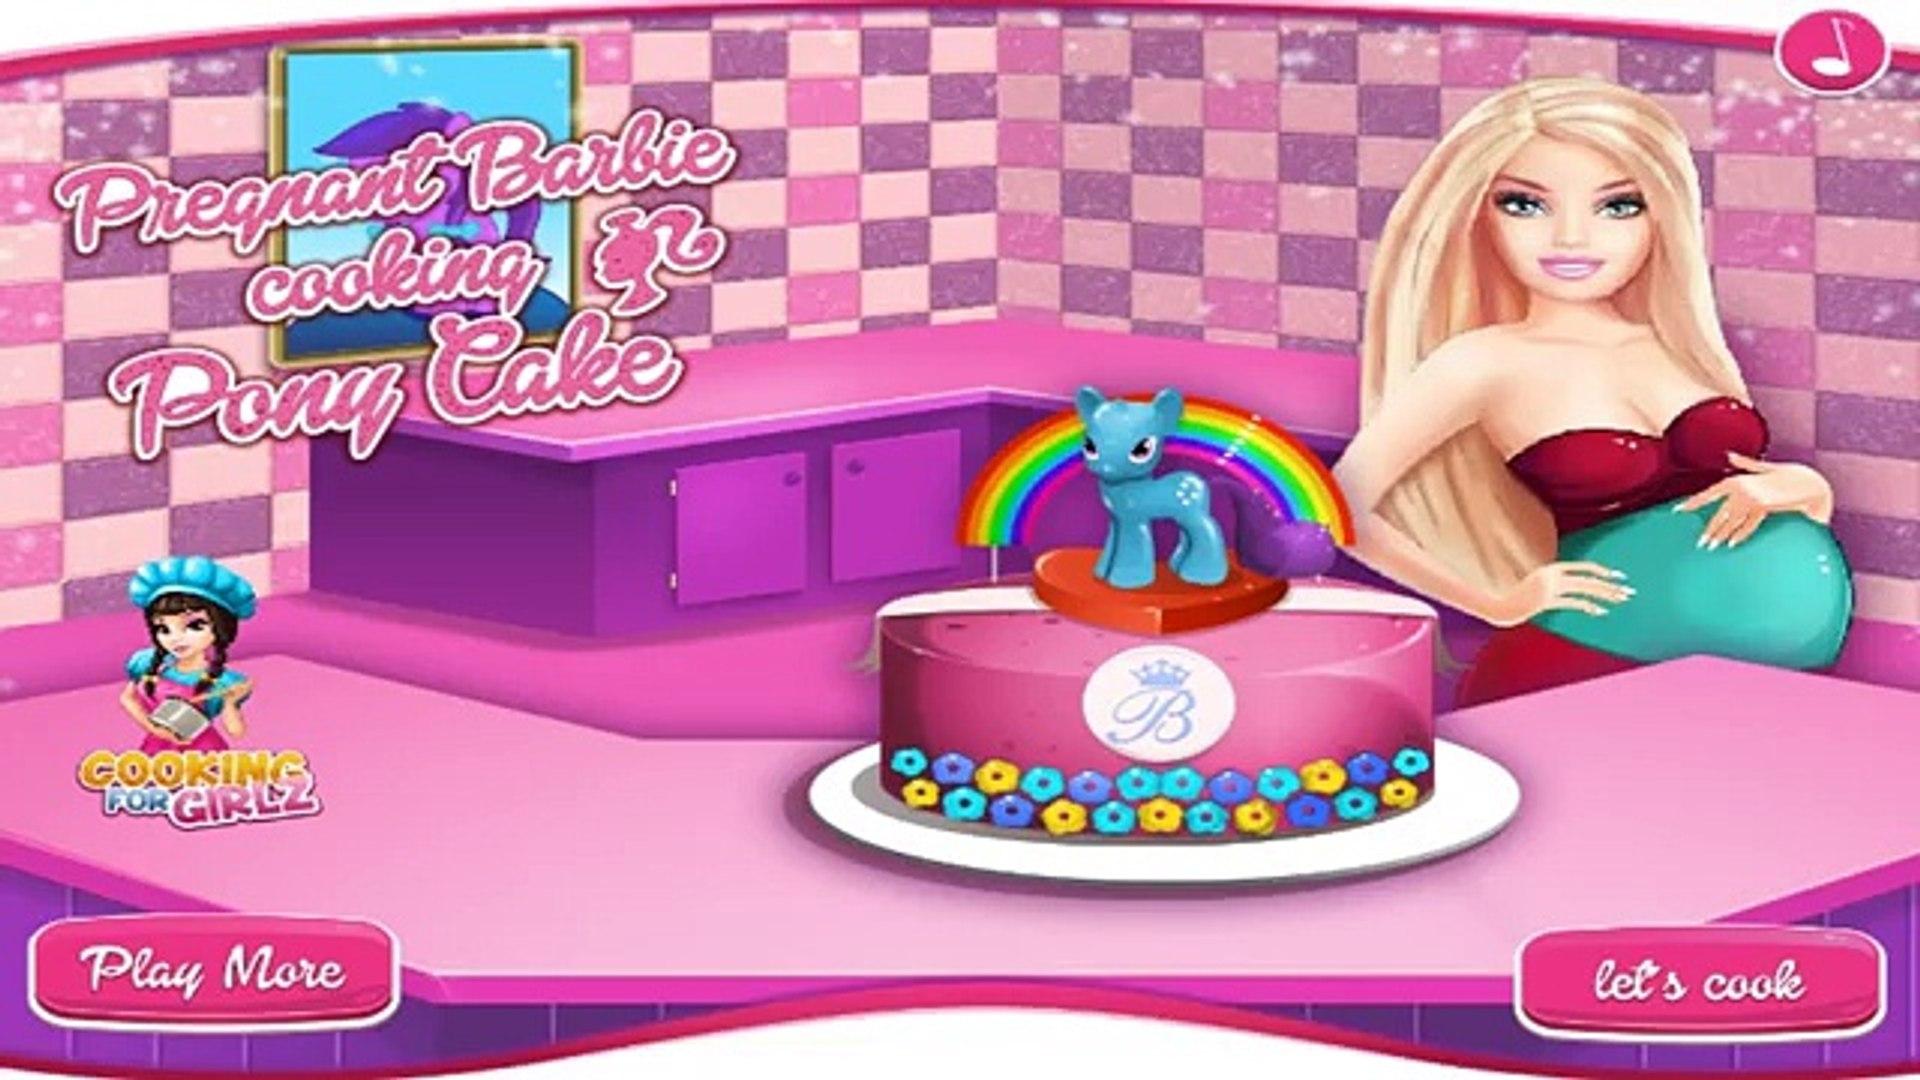 "Permainan Barbie Hamil Memasak Online Games Pregnant Barbie Cooking Pony Cake Barbie D Å‹•ç""» Dailymotion"